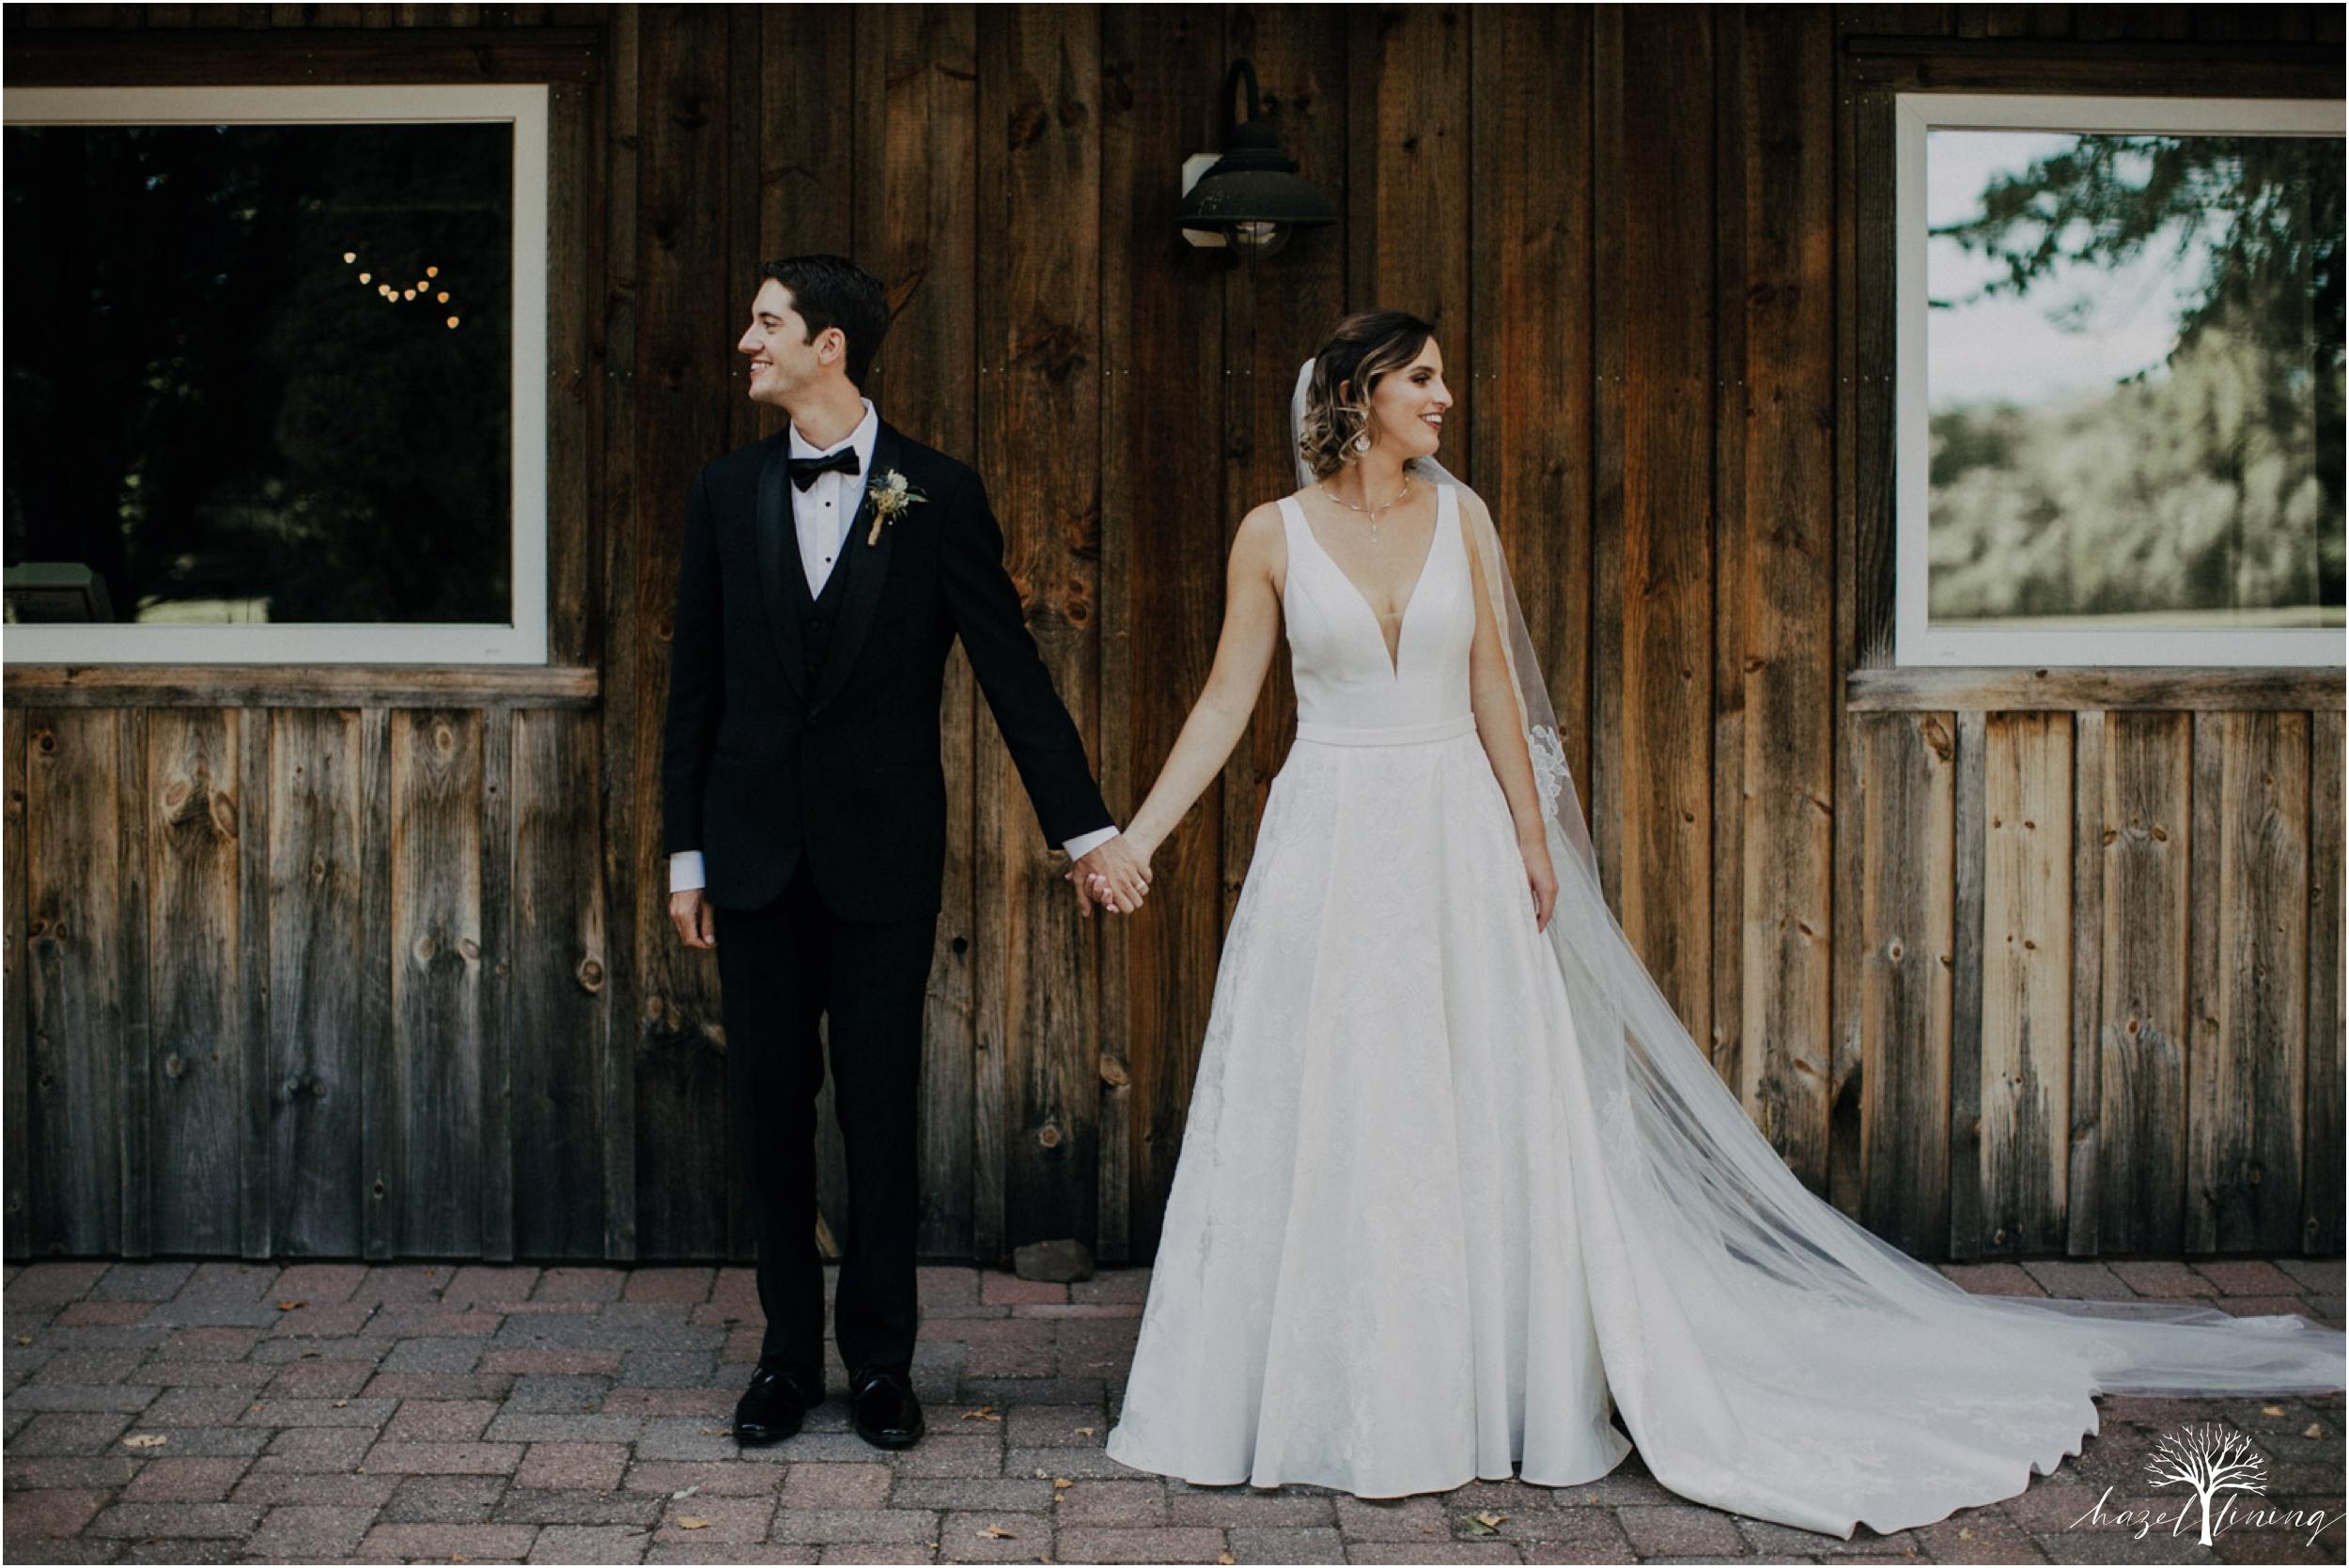 maureen-hepner-anthony-giordano-rose-bank-winery-newtow-pennsylvania-luxury-summer-wedding-hazel-lining-photography-destination-elopement-wedding-engagement-photography_0111.jpg